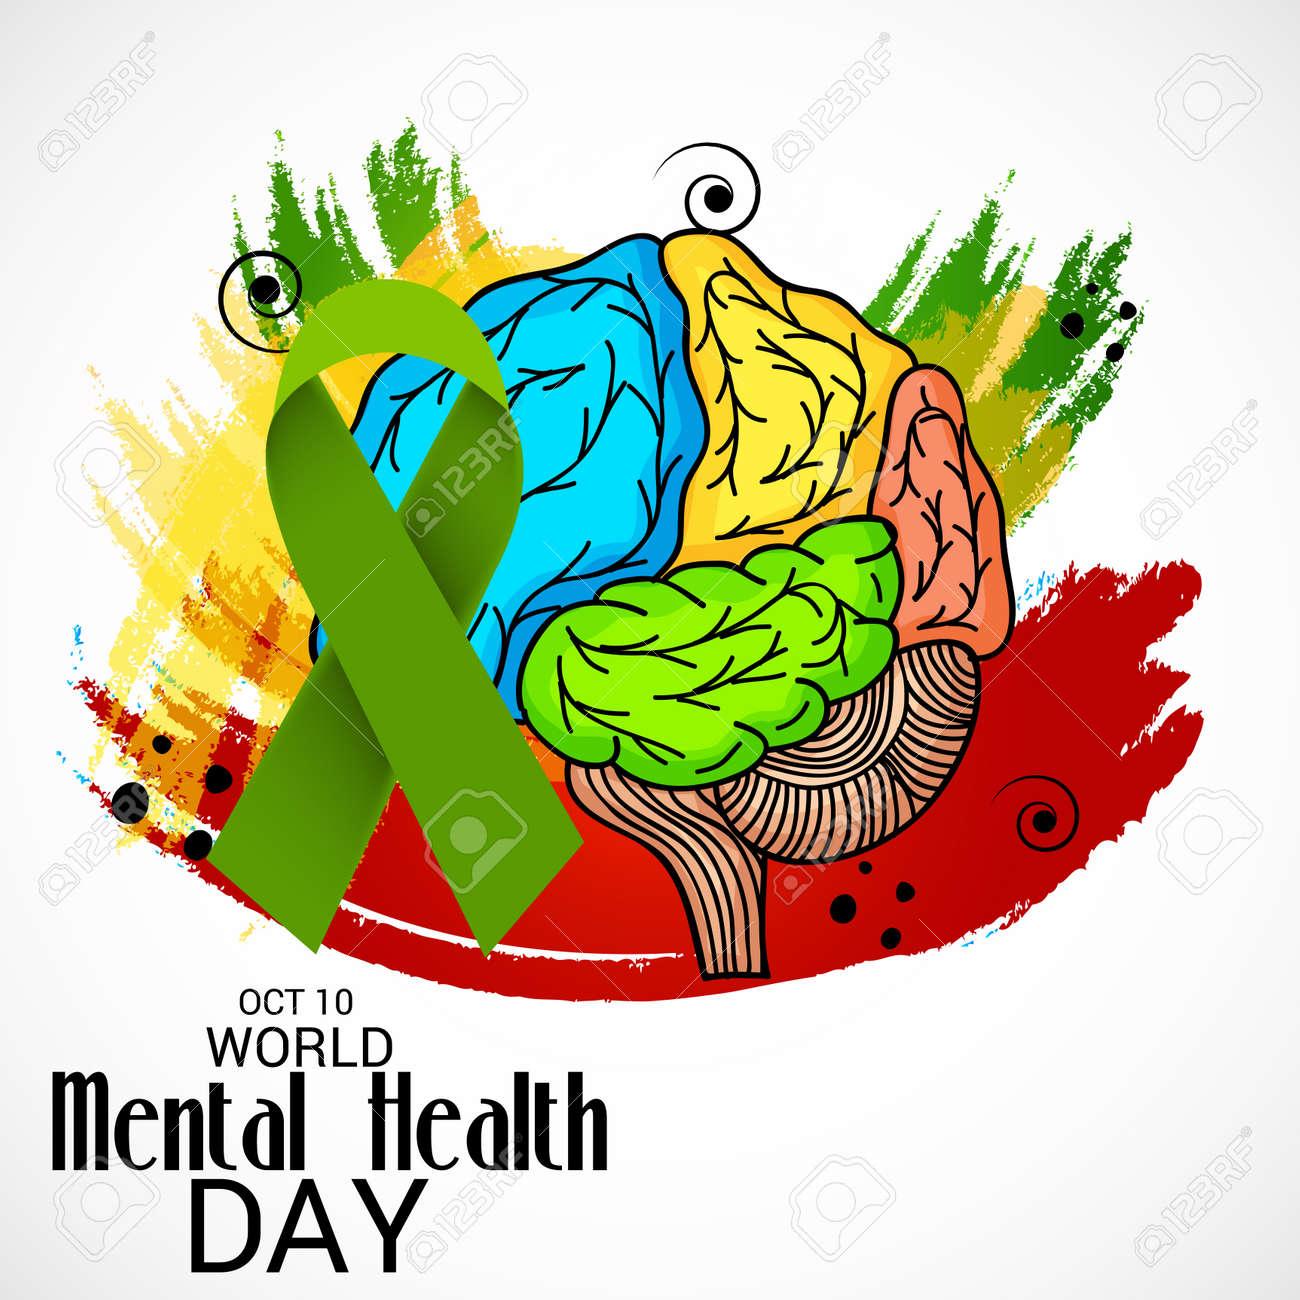 World Mental Health Day clipart - Health, Blue, Text, transparent clip art